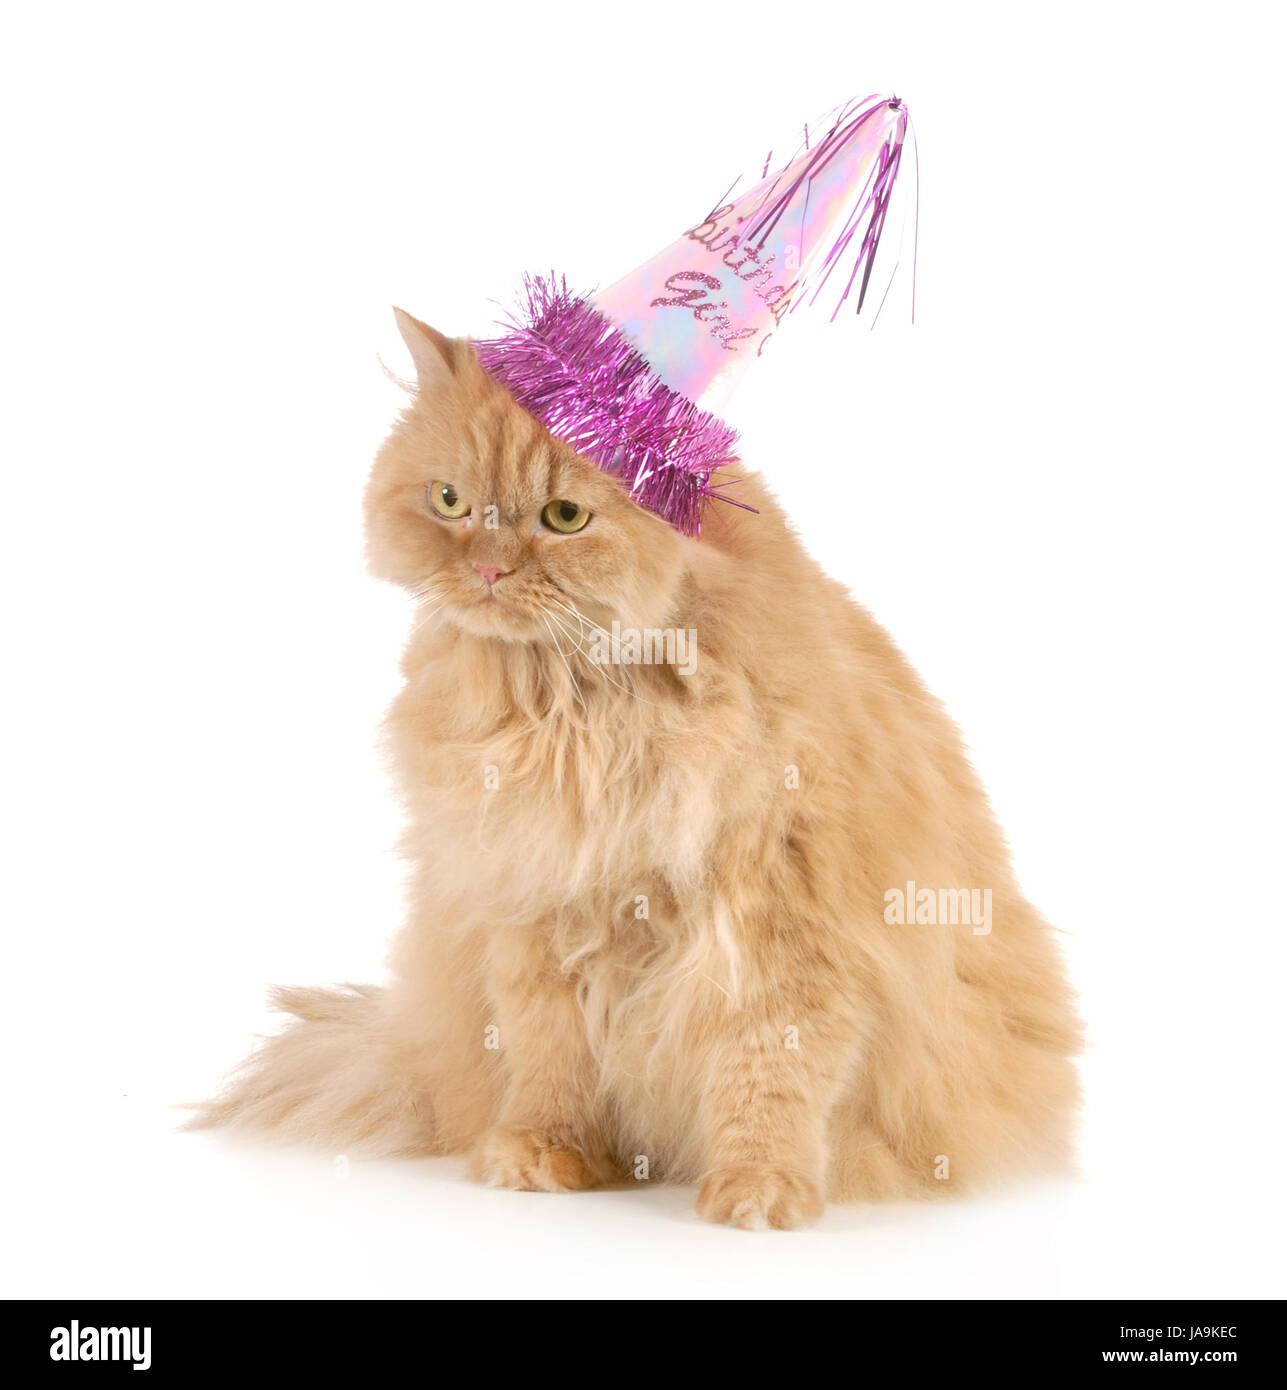 Geburtstag Bilder Katze Geburtstagswunsche Geburtstag Bilder